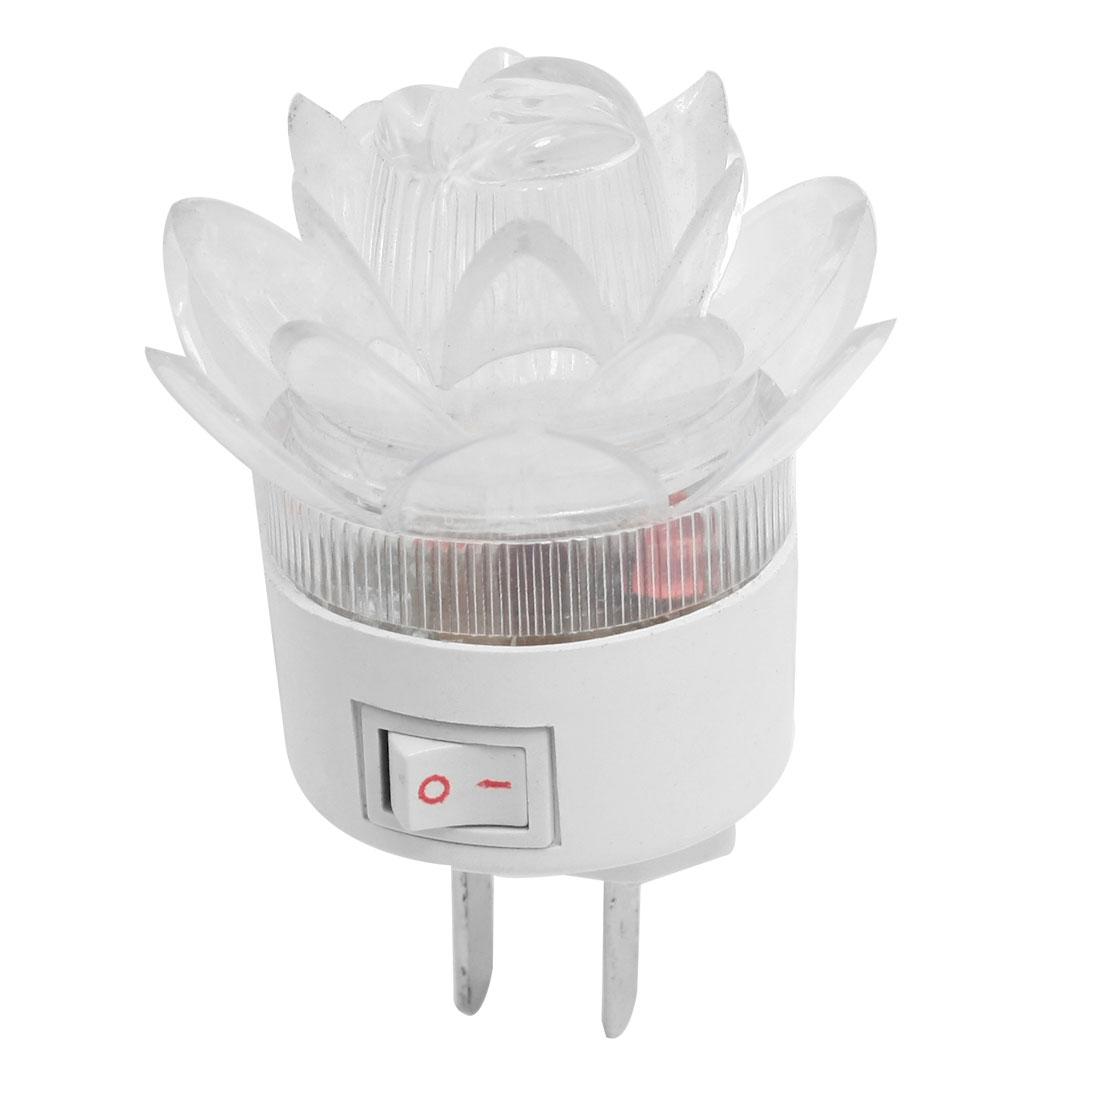 AC 160-250V 1W Home Room Flower Style Red Blue LED Light Night Lamp